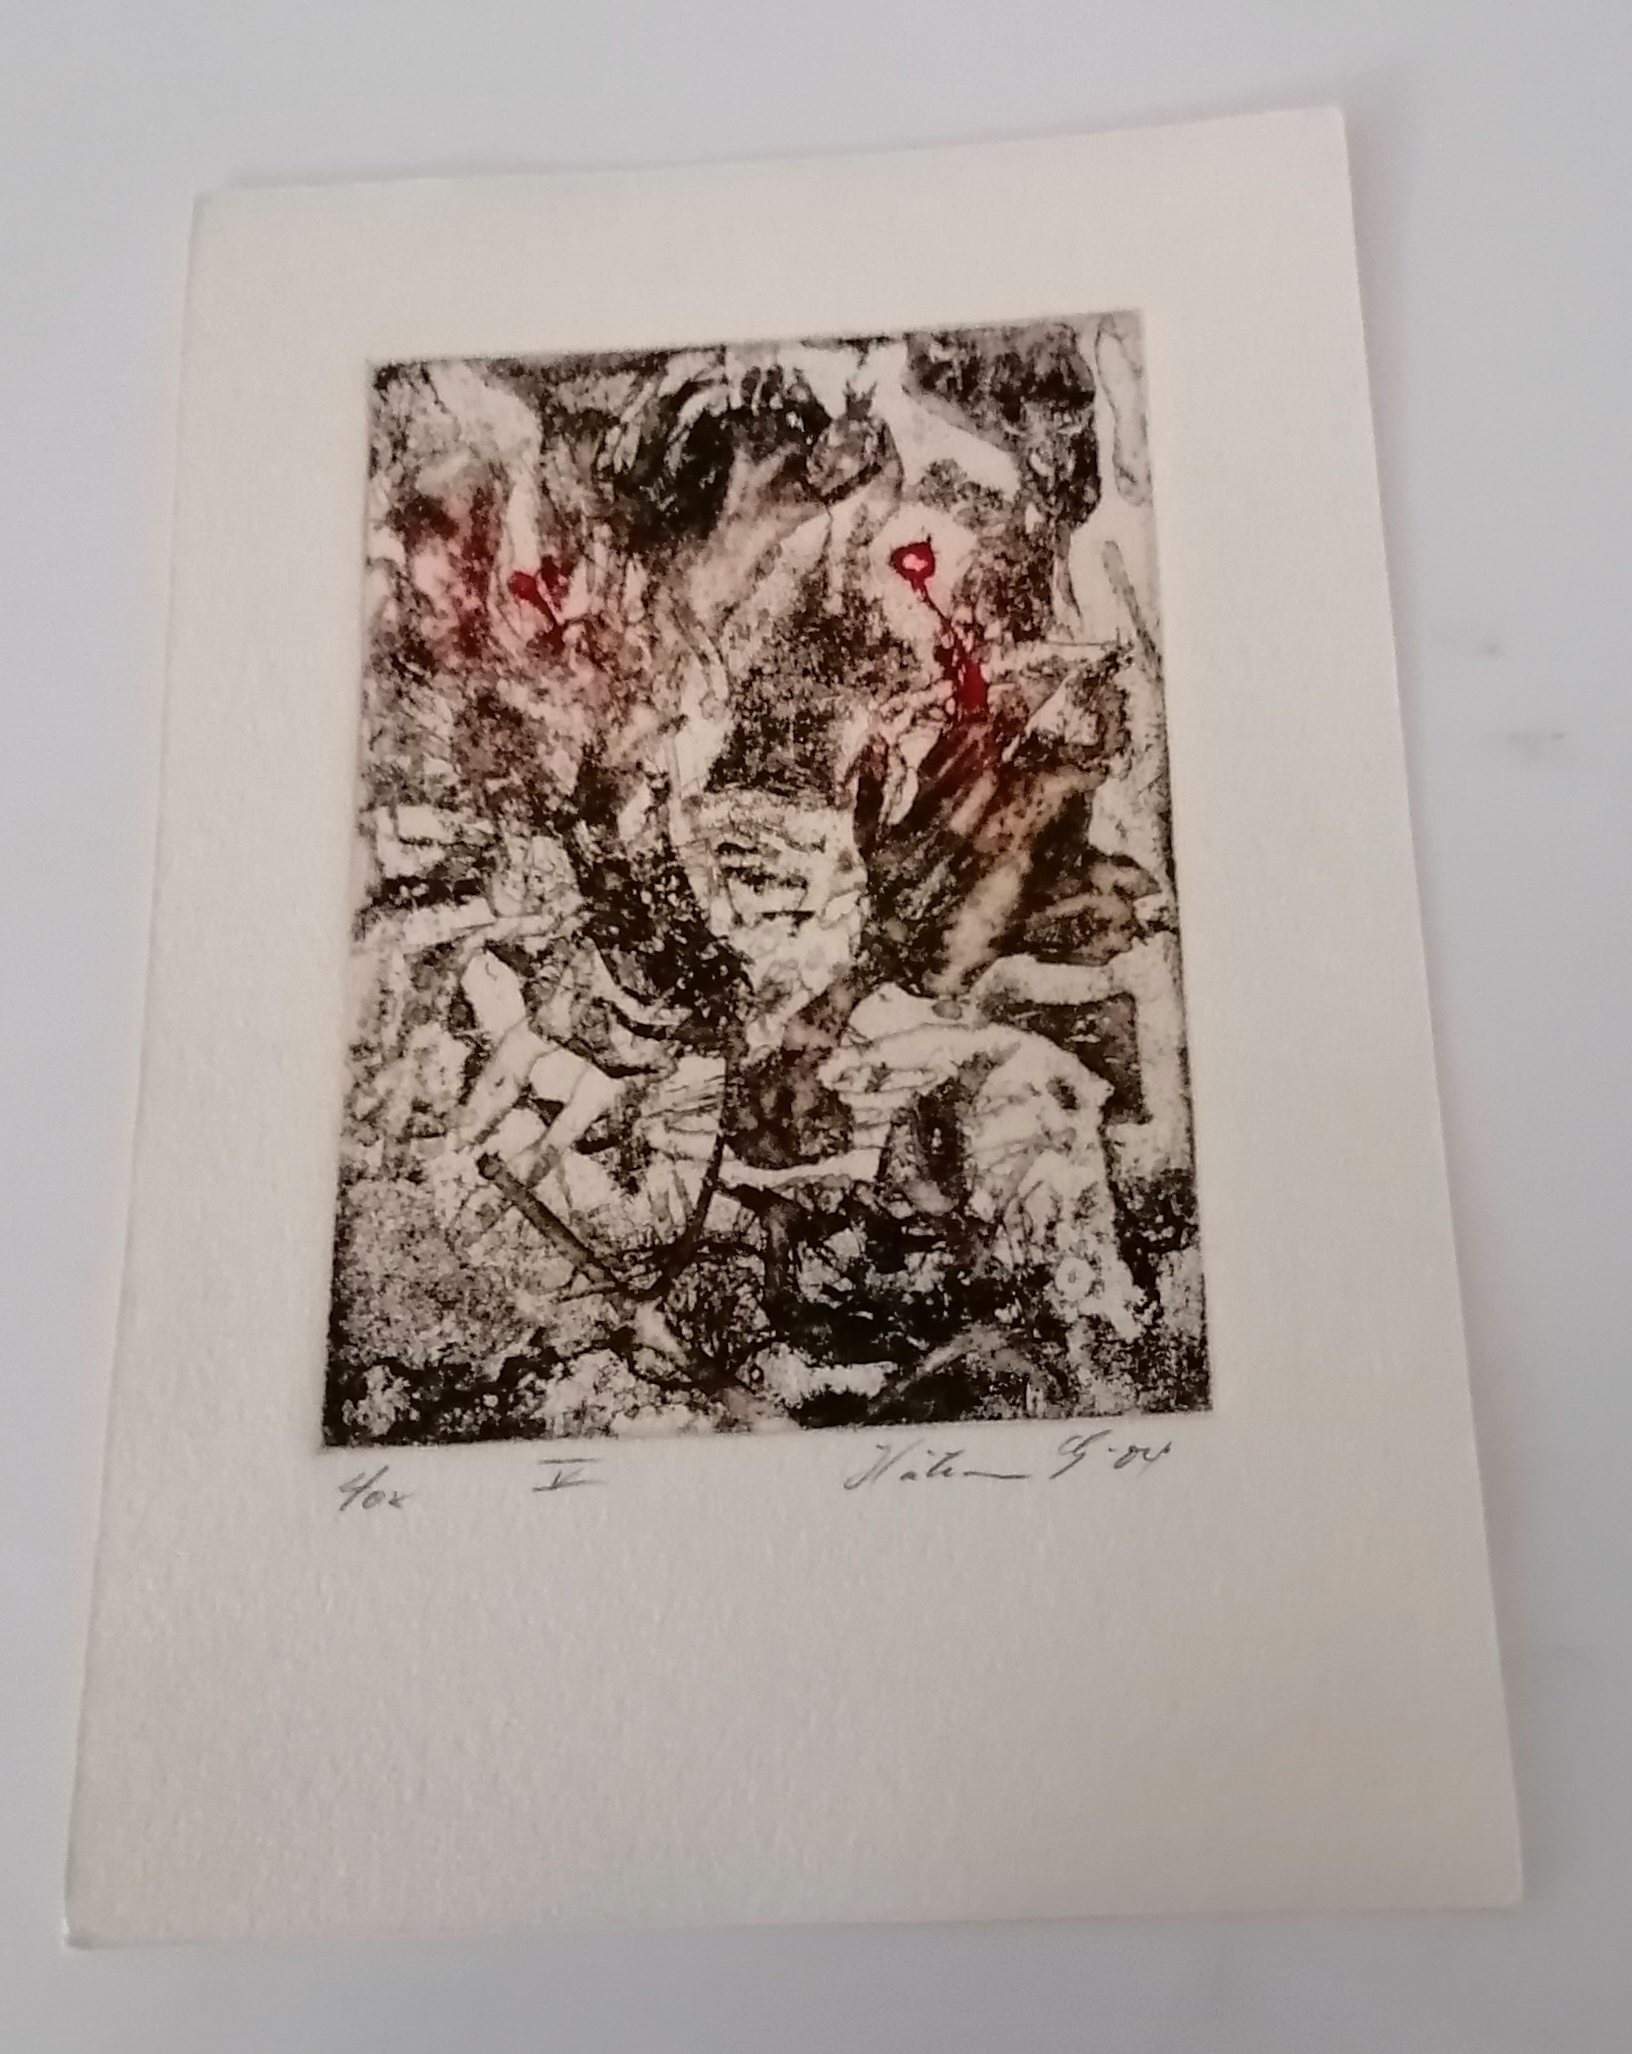 https://www.norstamps.com/content/images/stamps/gtgallerier/200.jpg